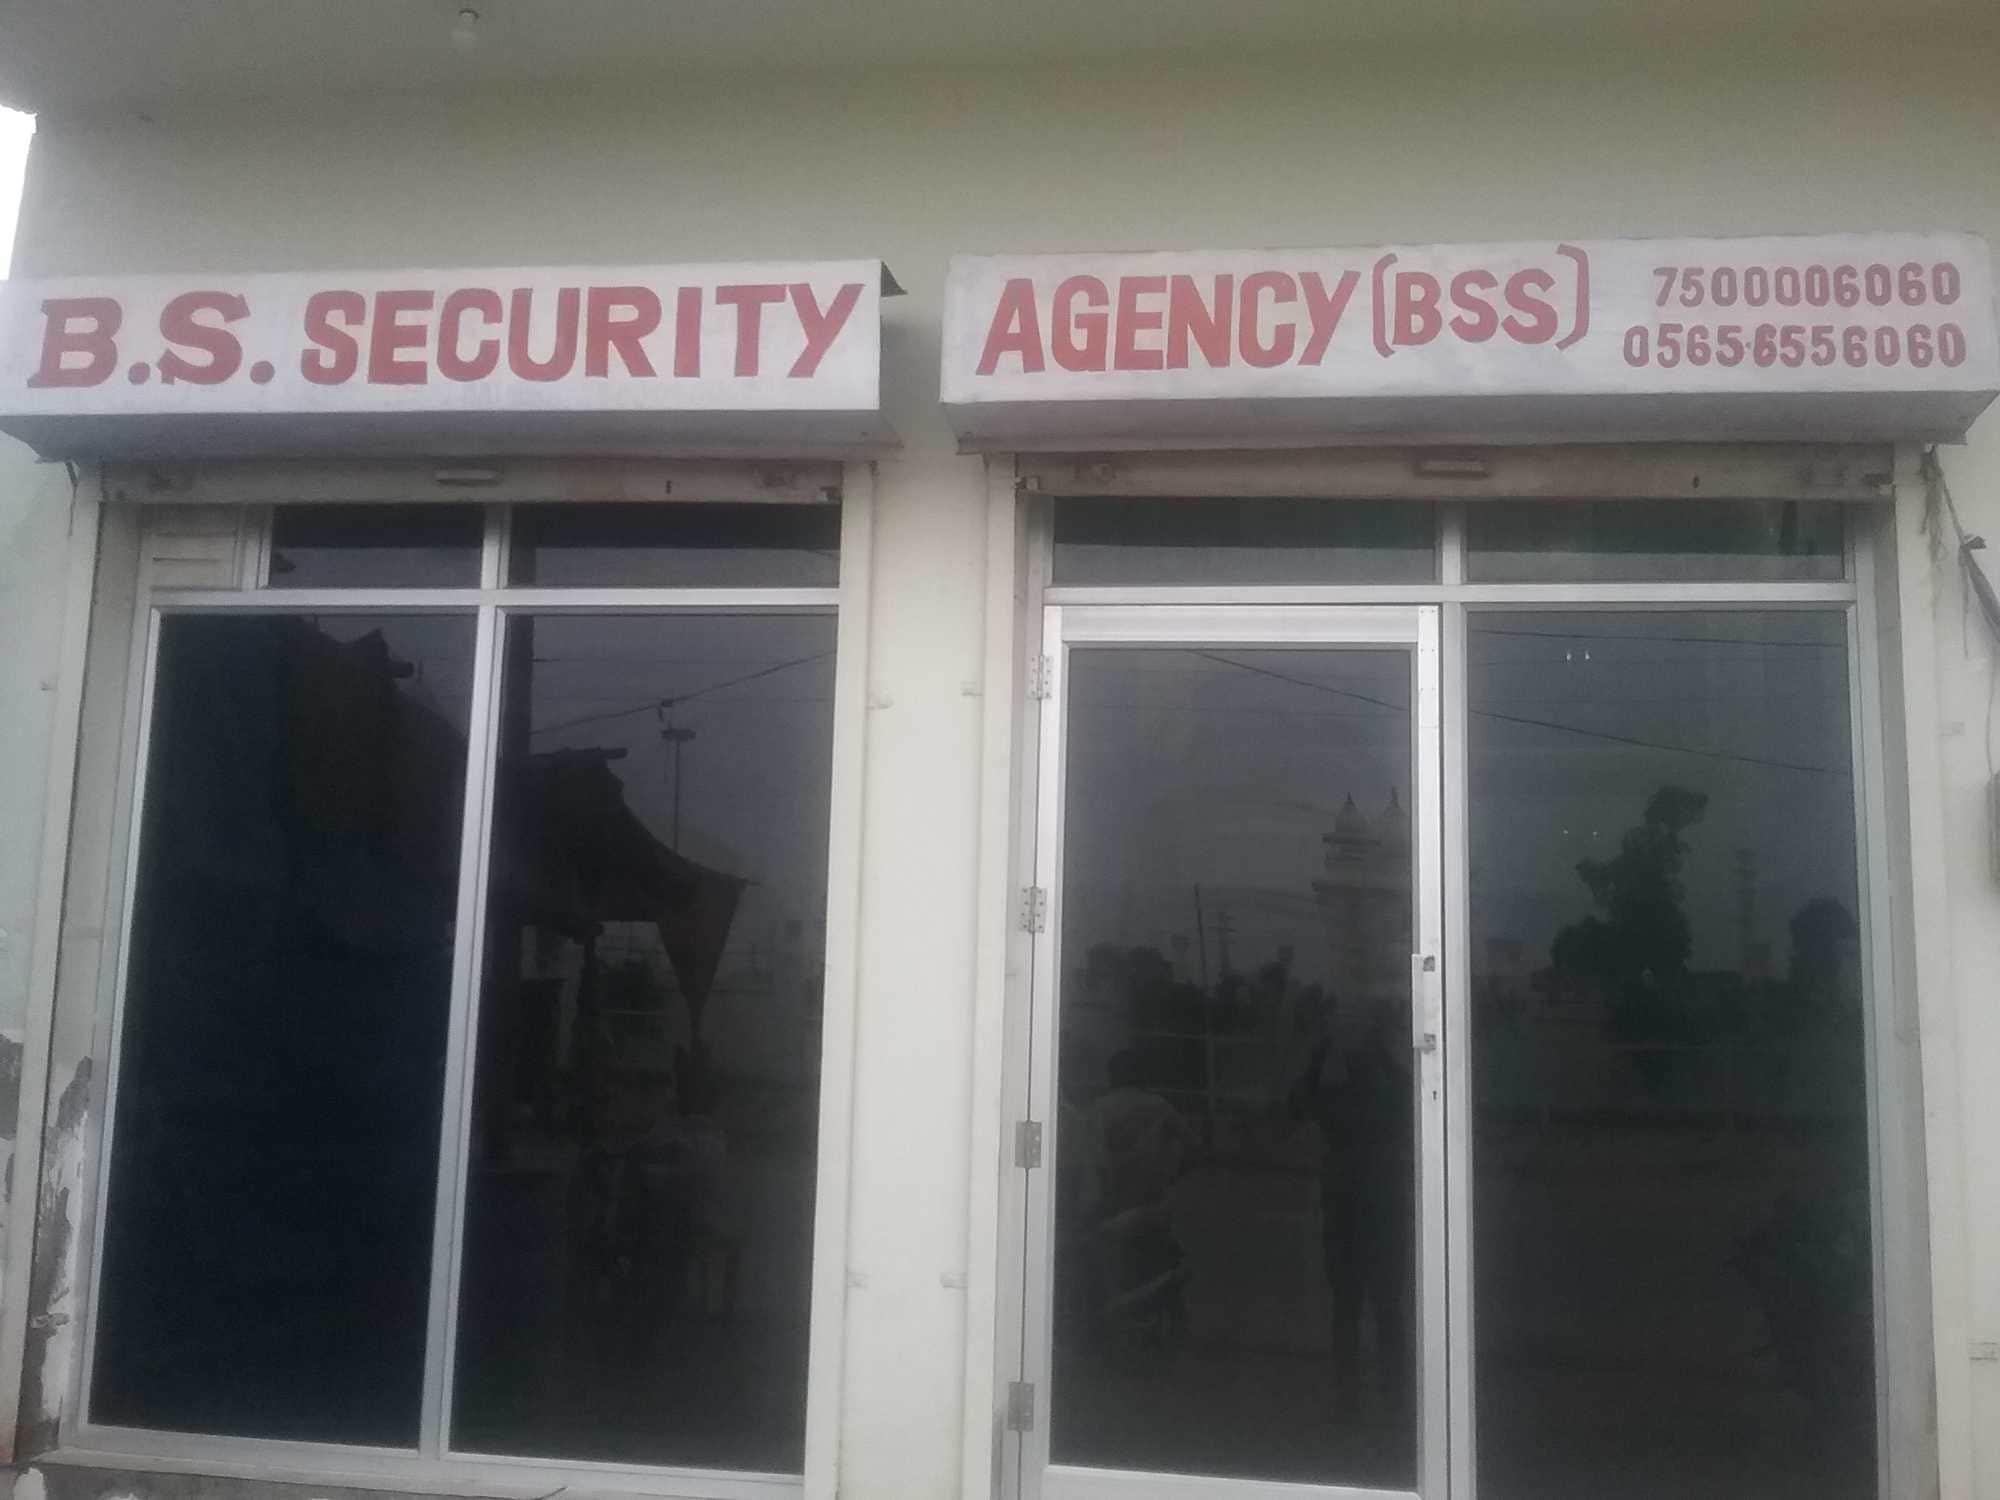 Security Escort Services in Kosi Kalan, Mathura